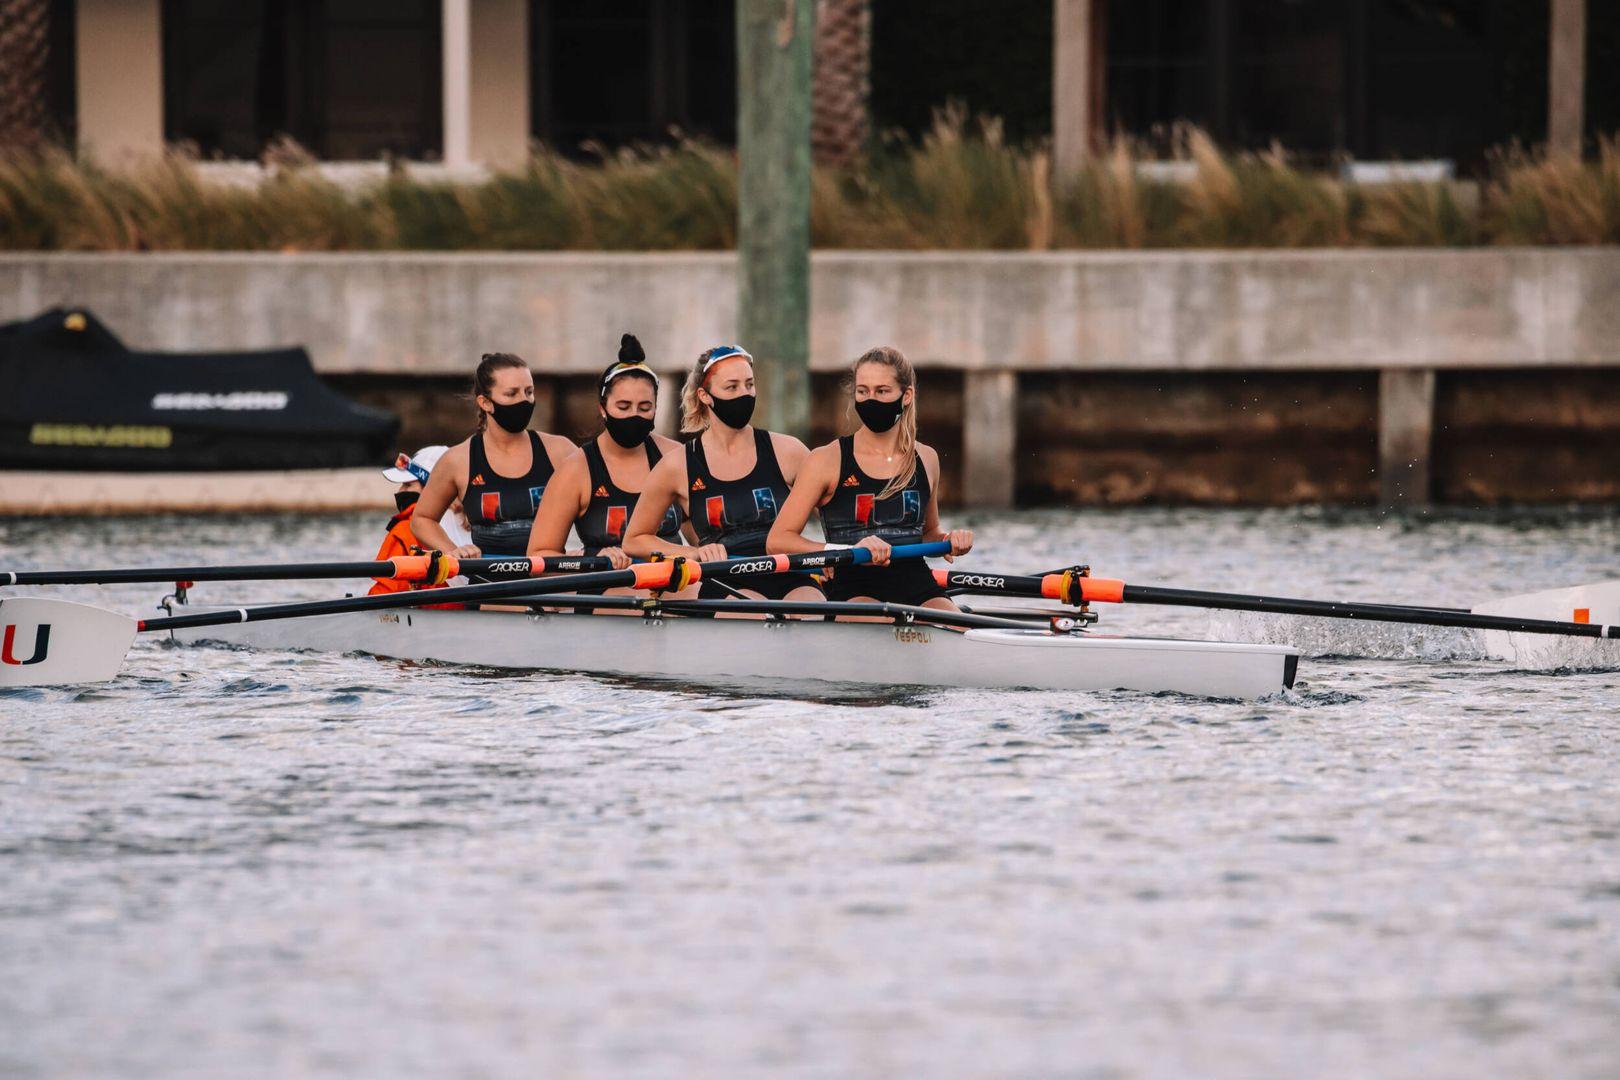 Miami Opens 2021 Season on a High Note